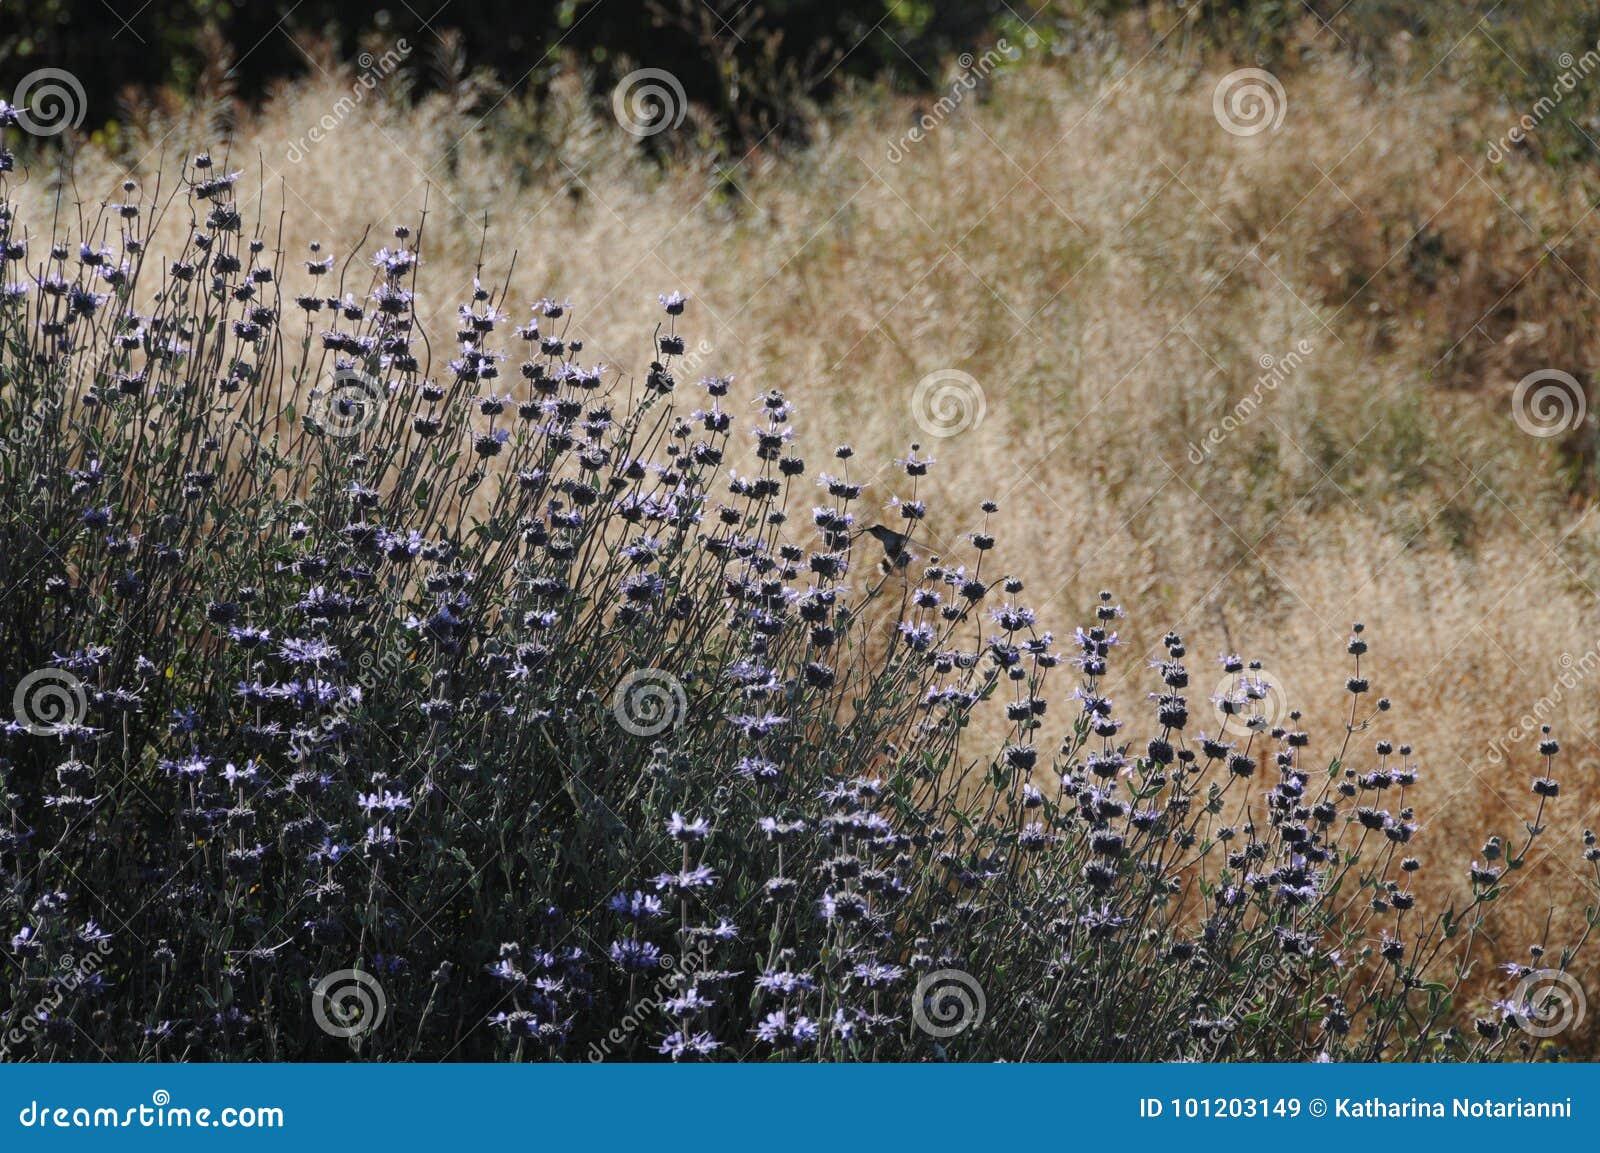 Salvia Clevelandii Purple Sage Flowering-Weide